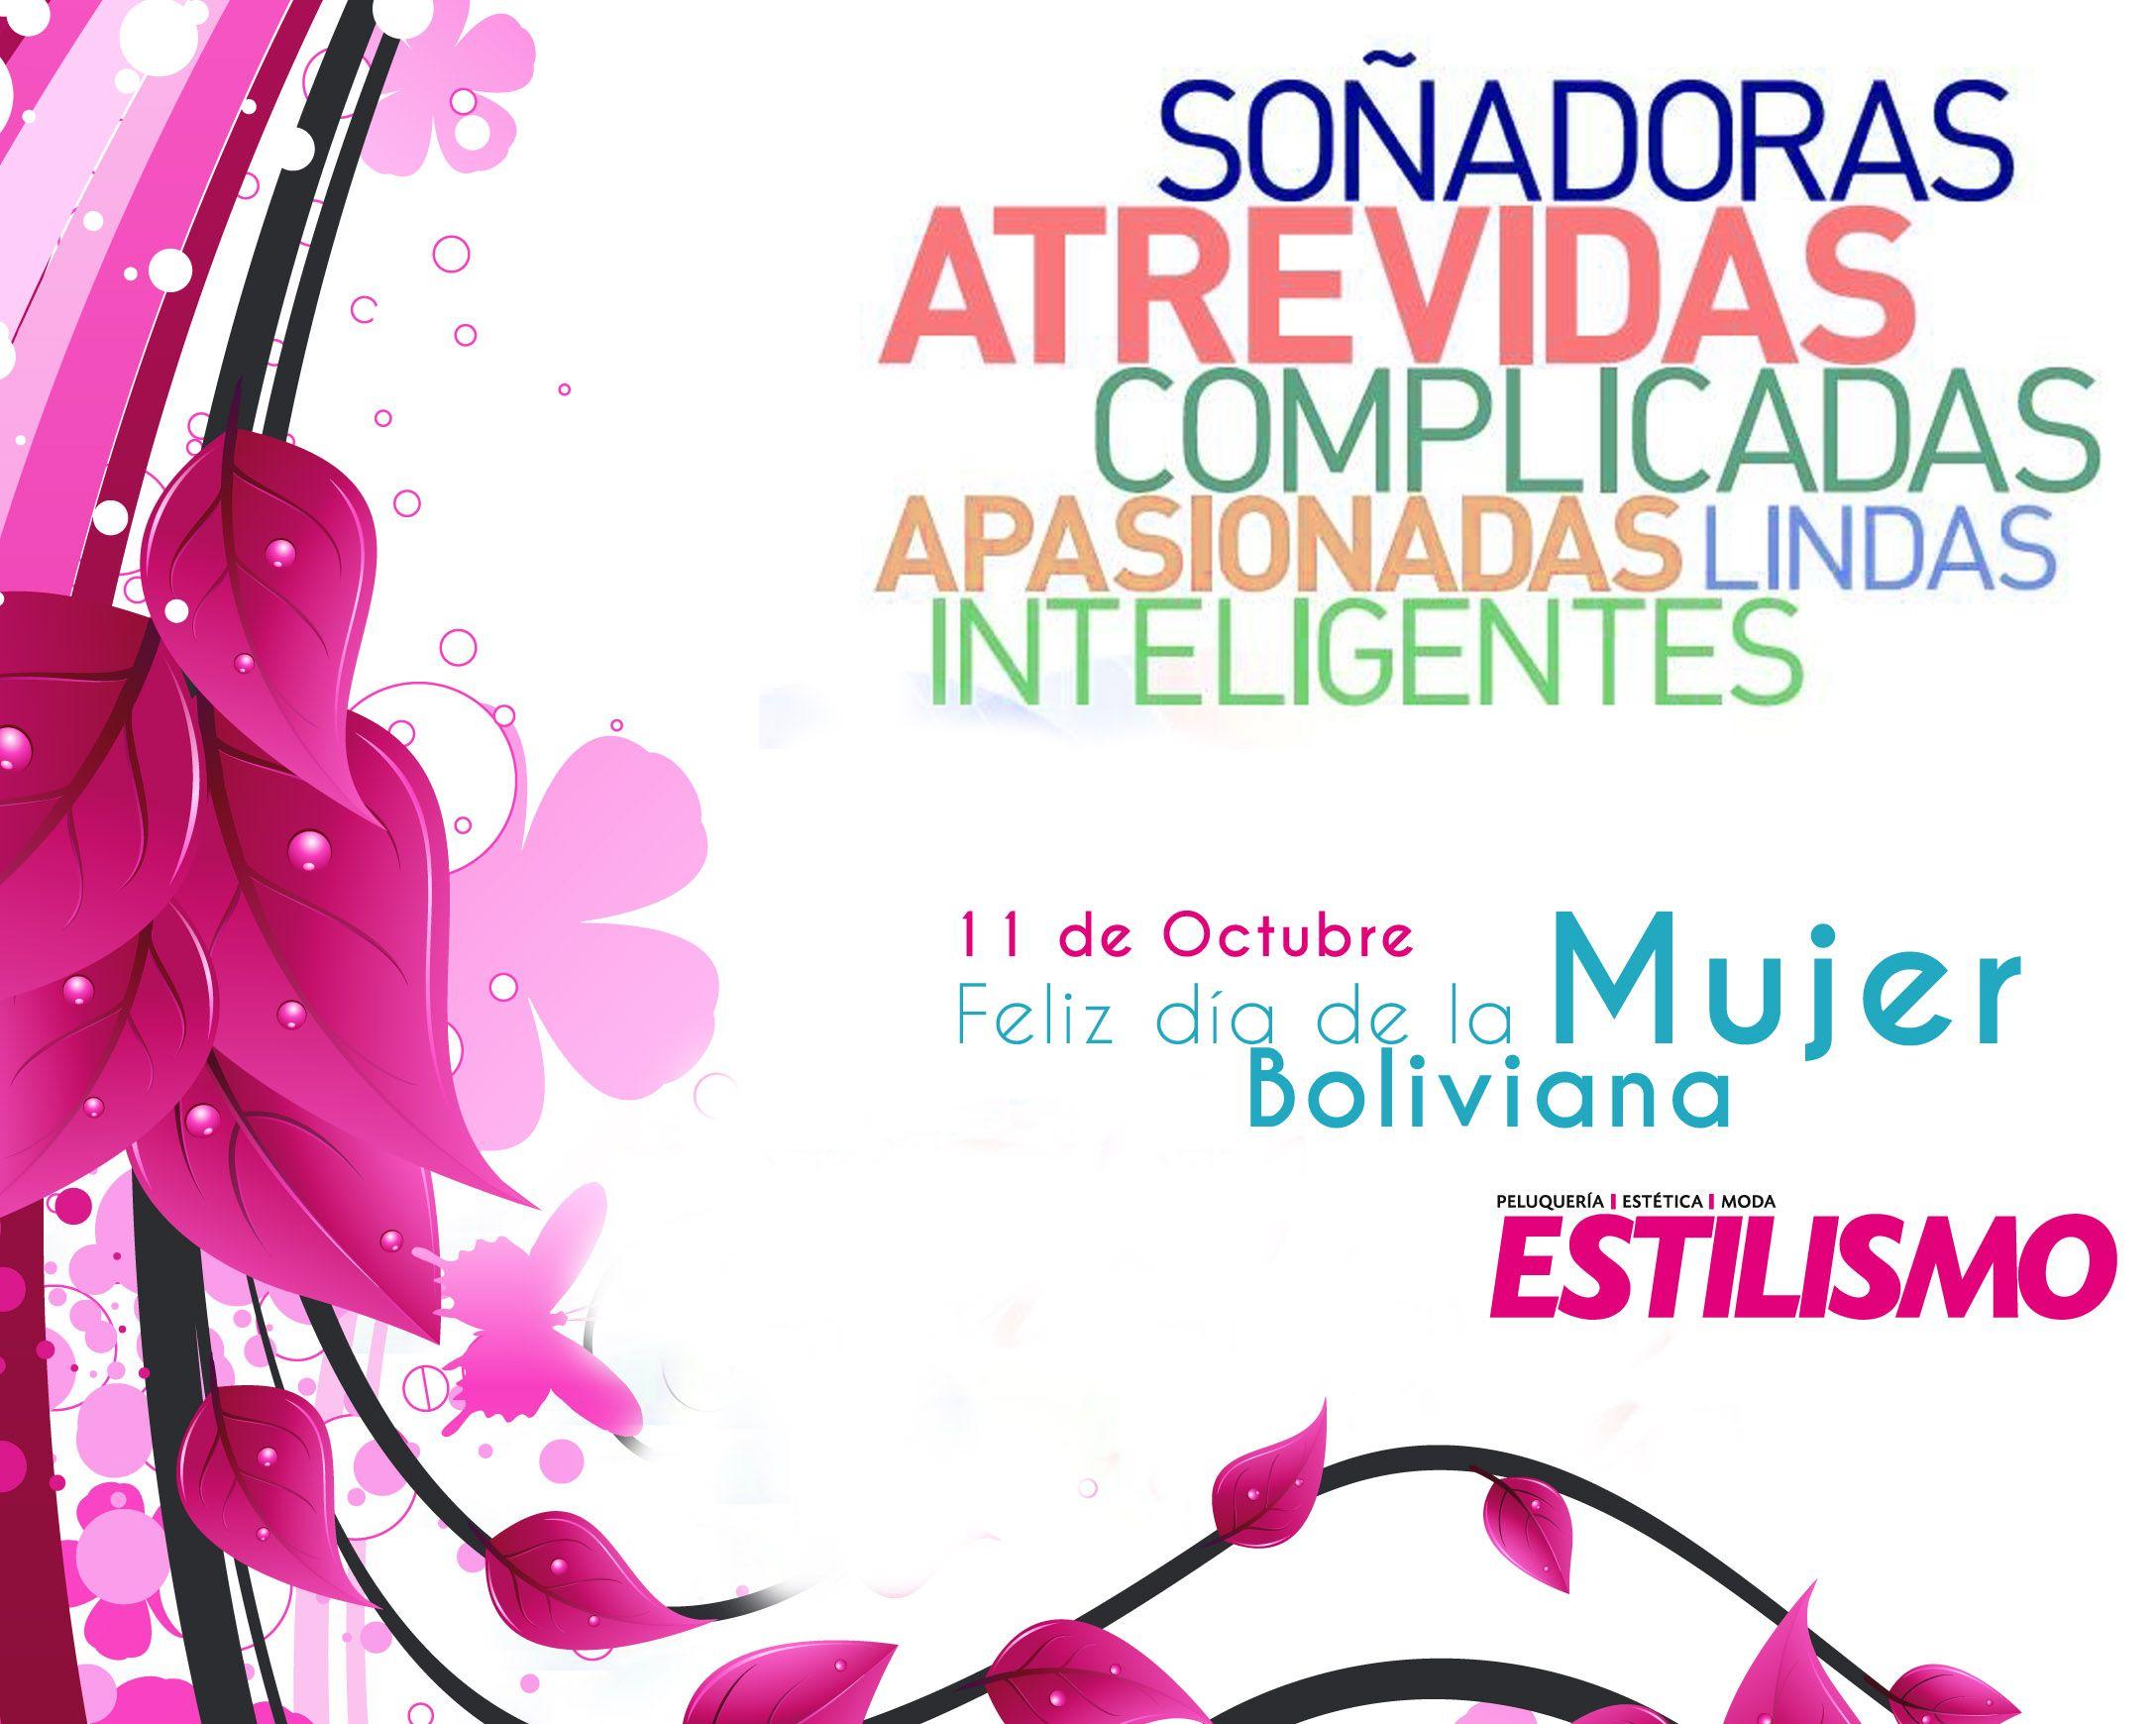 Feliz Dia De La Hermosa Mujer Boliviana Eres mujer, y eso no es poca cosa. feliz dia de la hermosa mujer boliviana